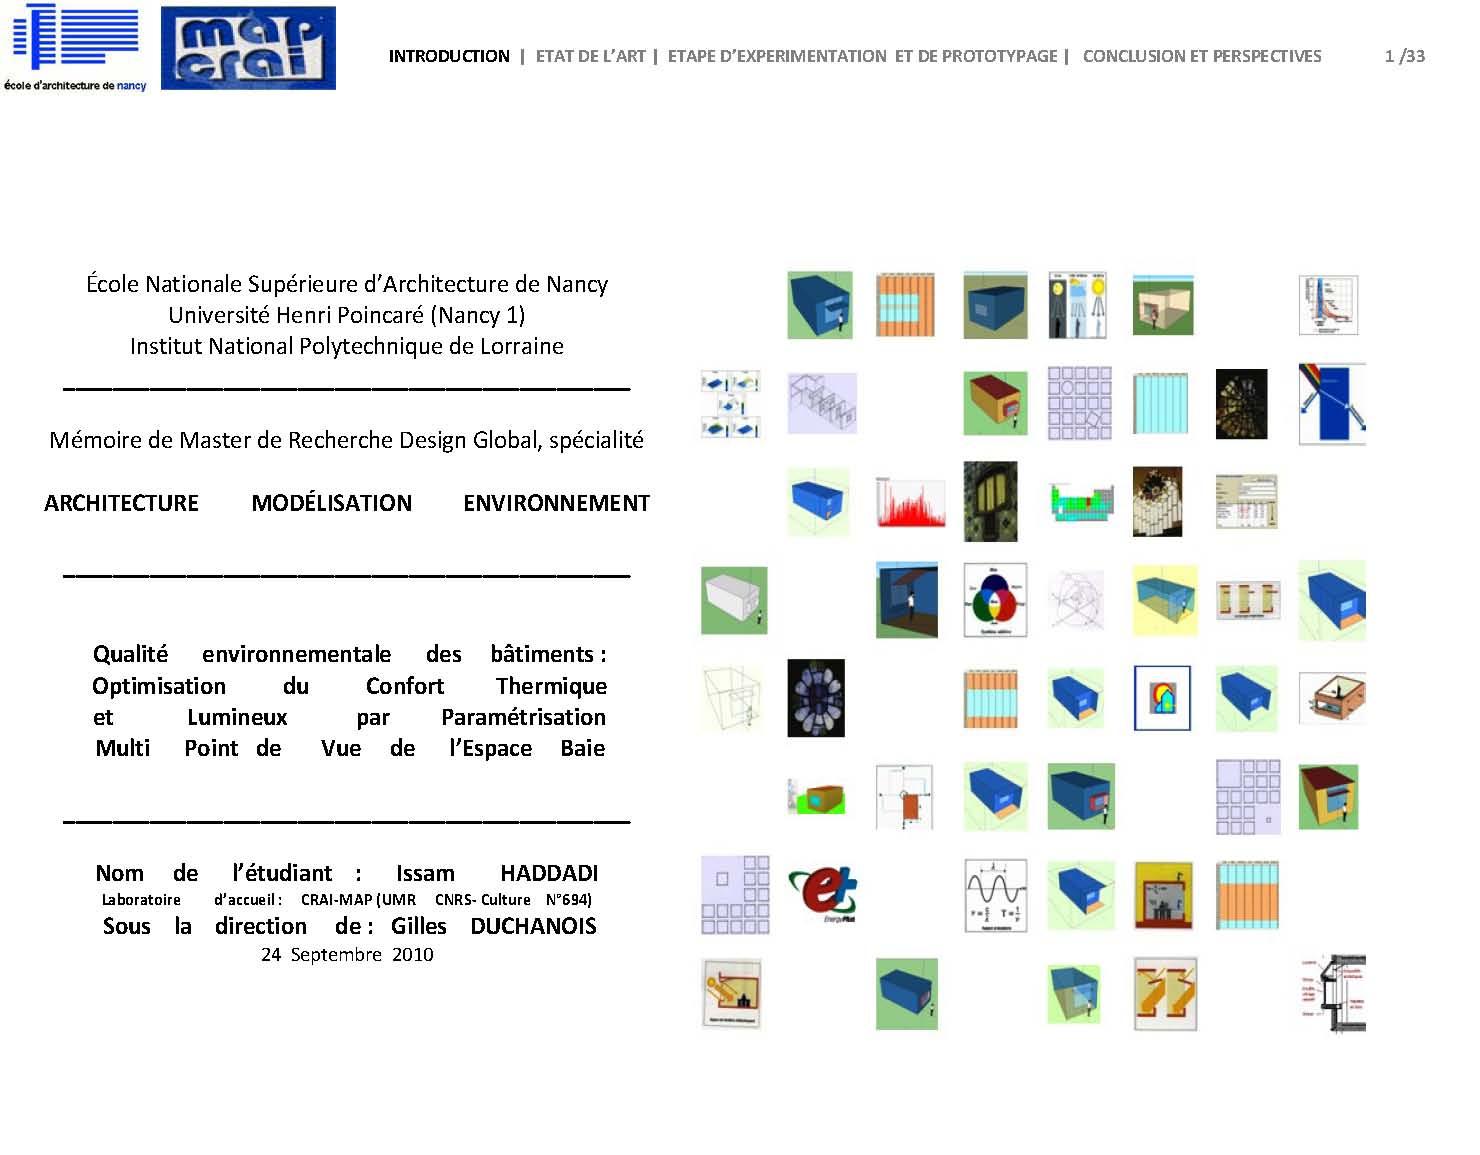 http://static.onlc.eu/architecteNDD//128629597738.jpg